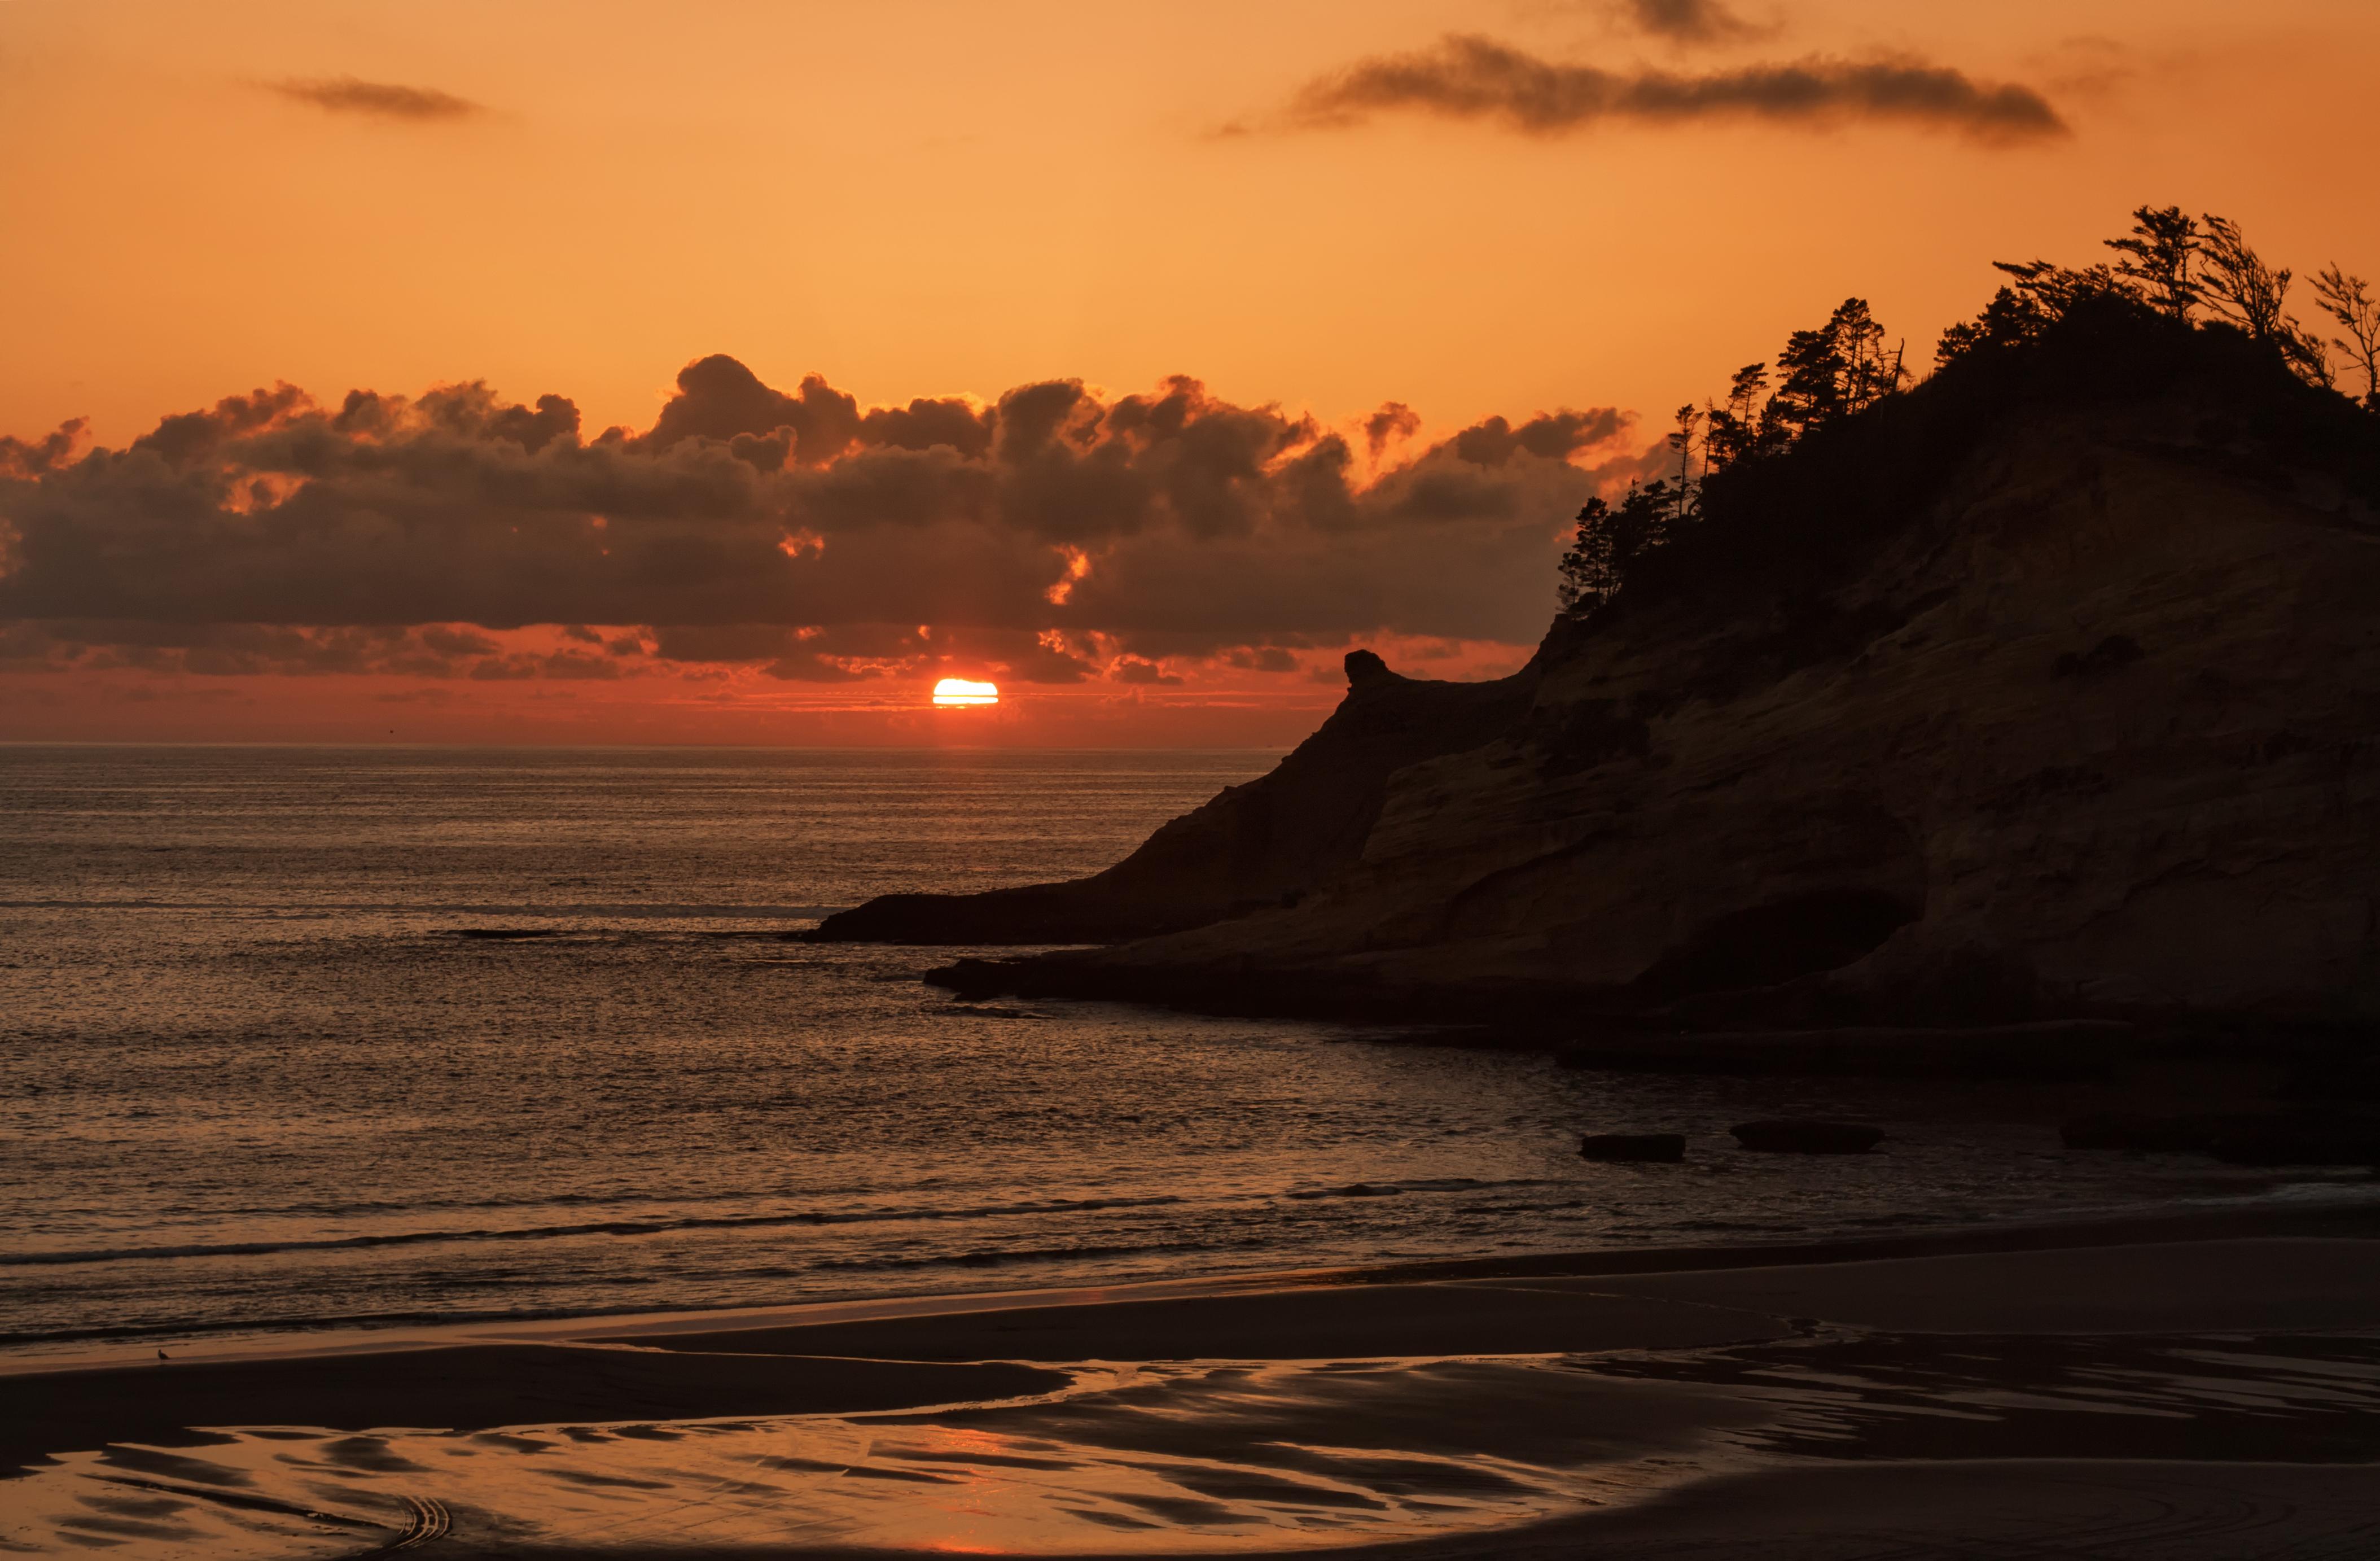 Pacific setting sun